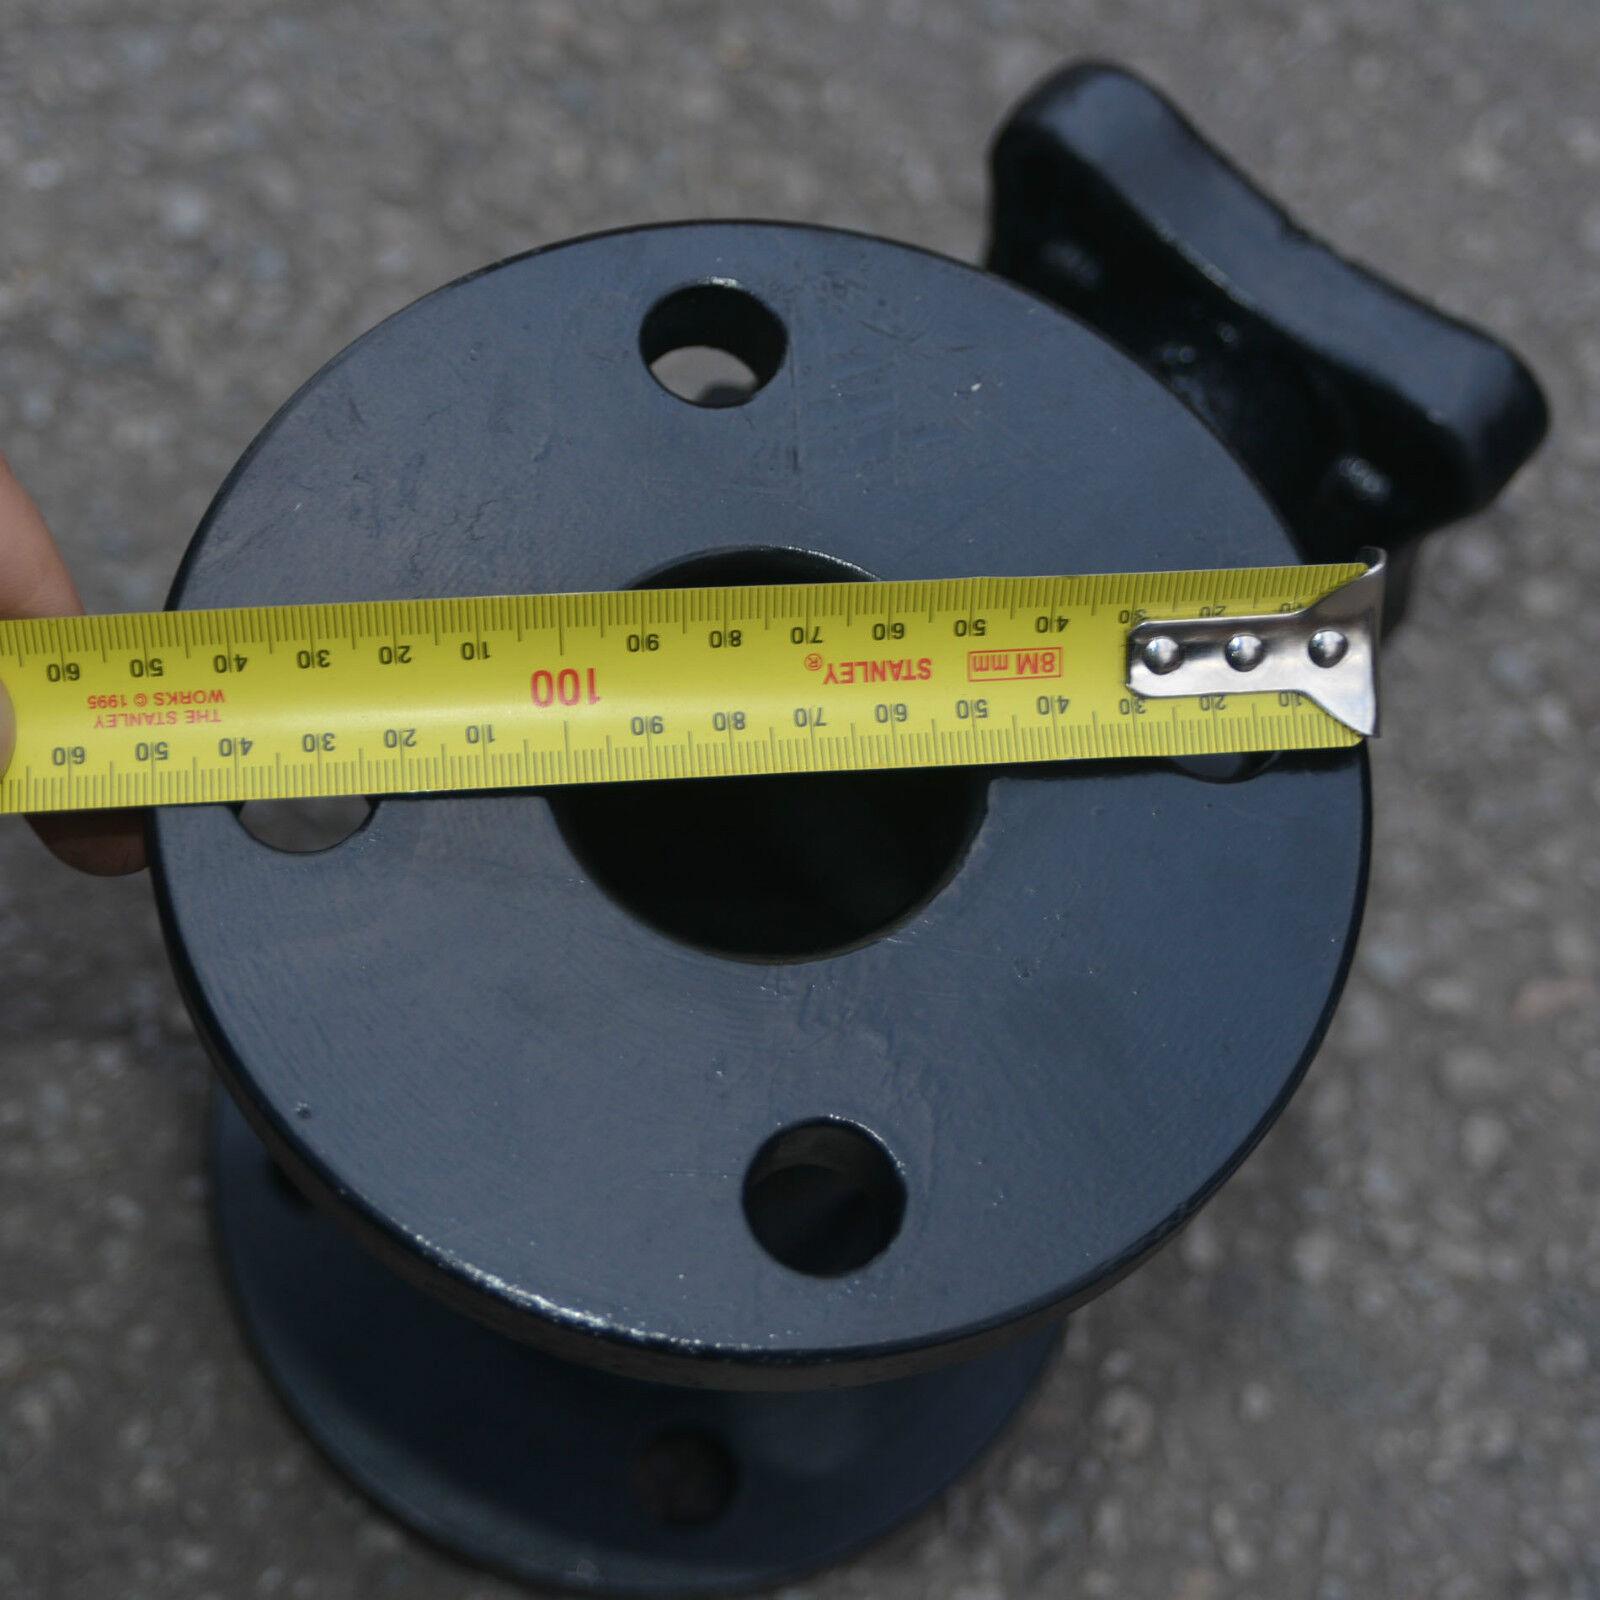 Kdv 2 in dn50 pn 16 diaphragm valve 6406 12660 picclick uk 6 of 12 kdv 2 in dn50 pn 16 diaphragm valve 6406 7 of 12 kdv 2 in dn50 pn 16 diaphragm valve ccuart Gallery